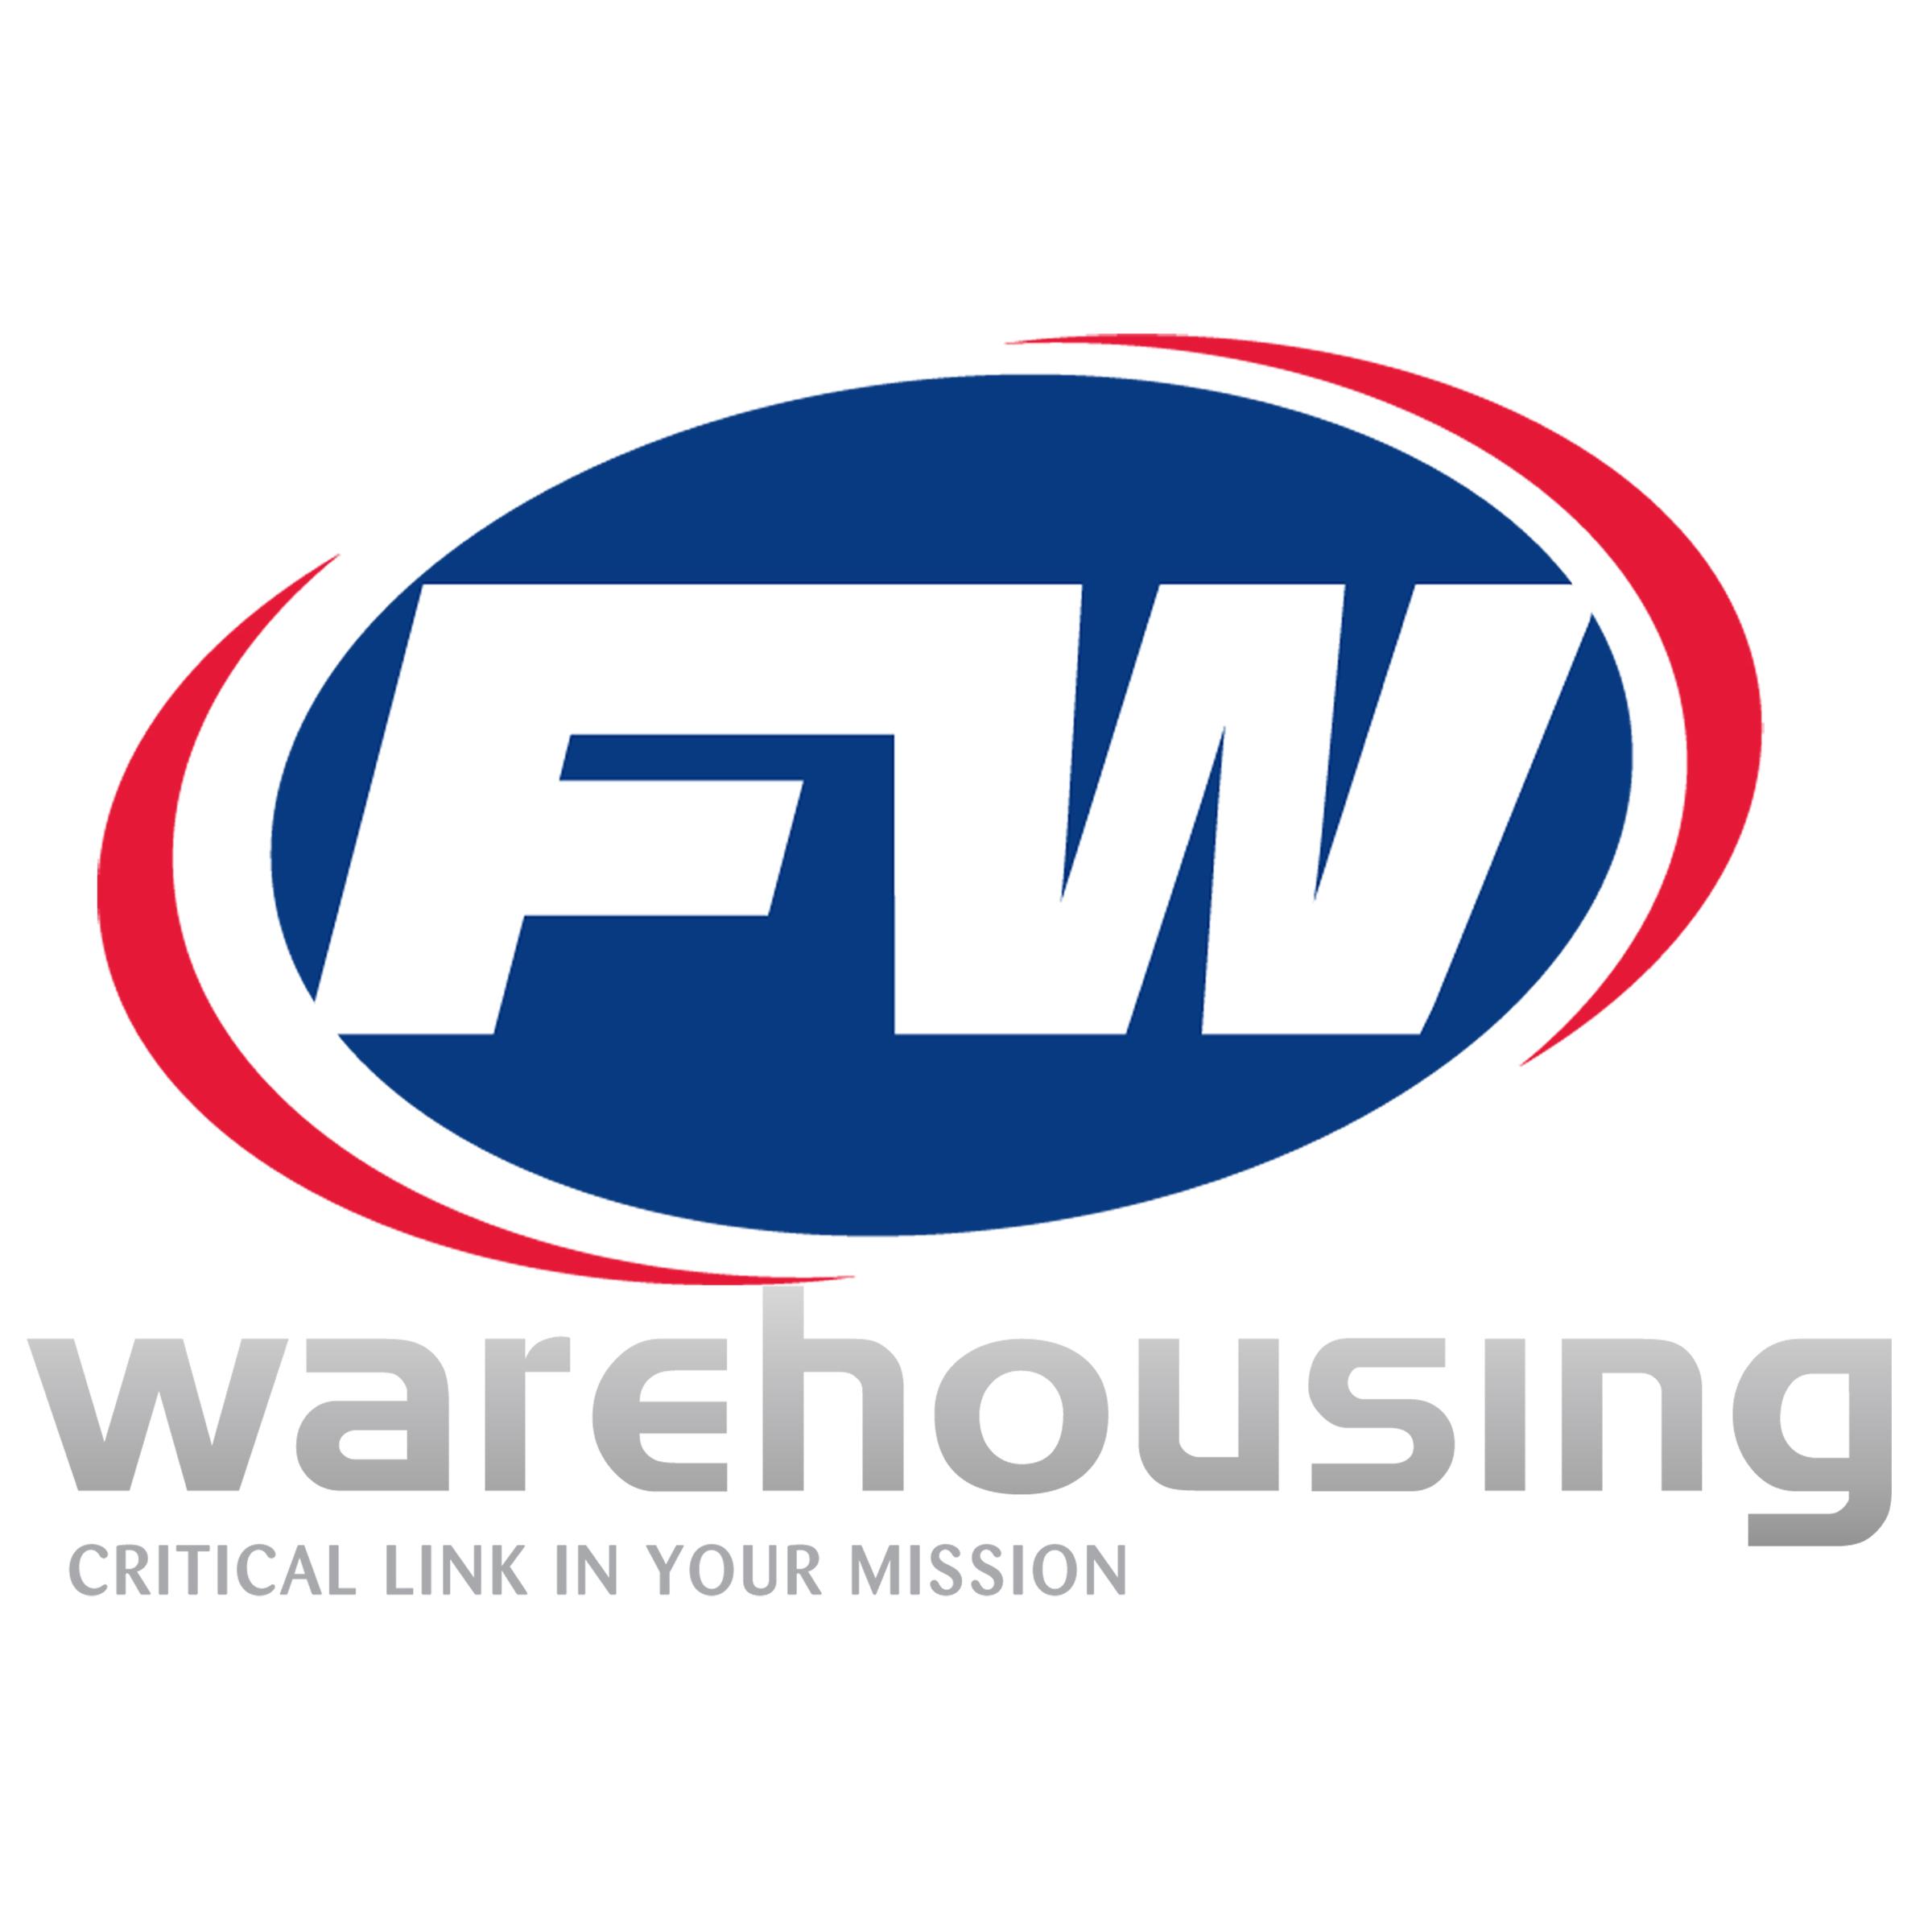 FW Warehousing - Kansas City